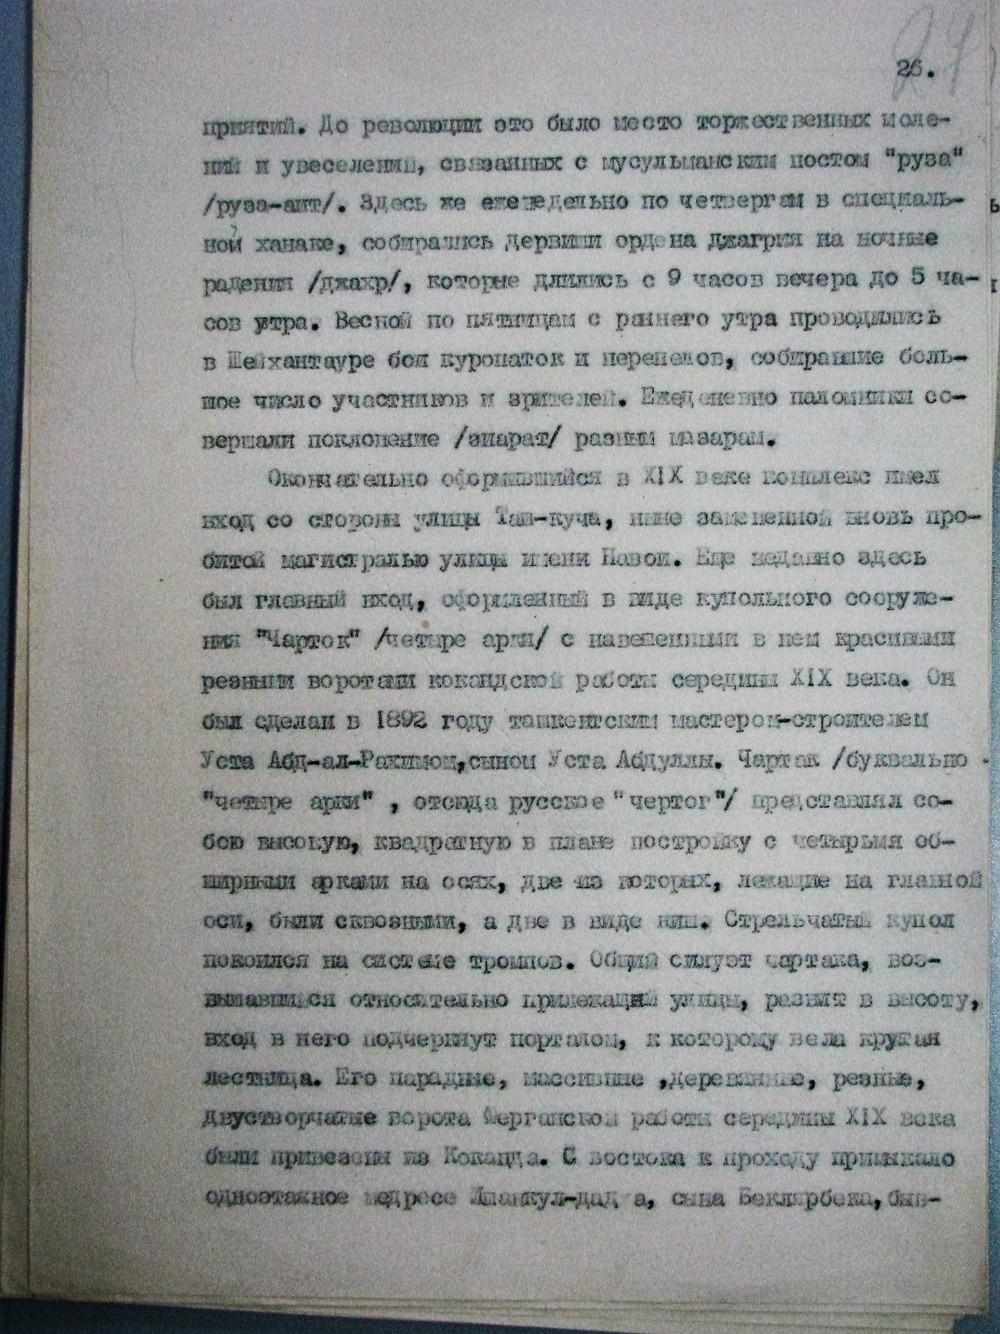 Ташкент, Массон (25)